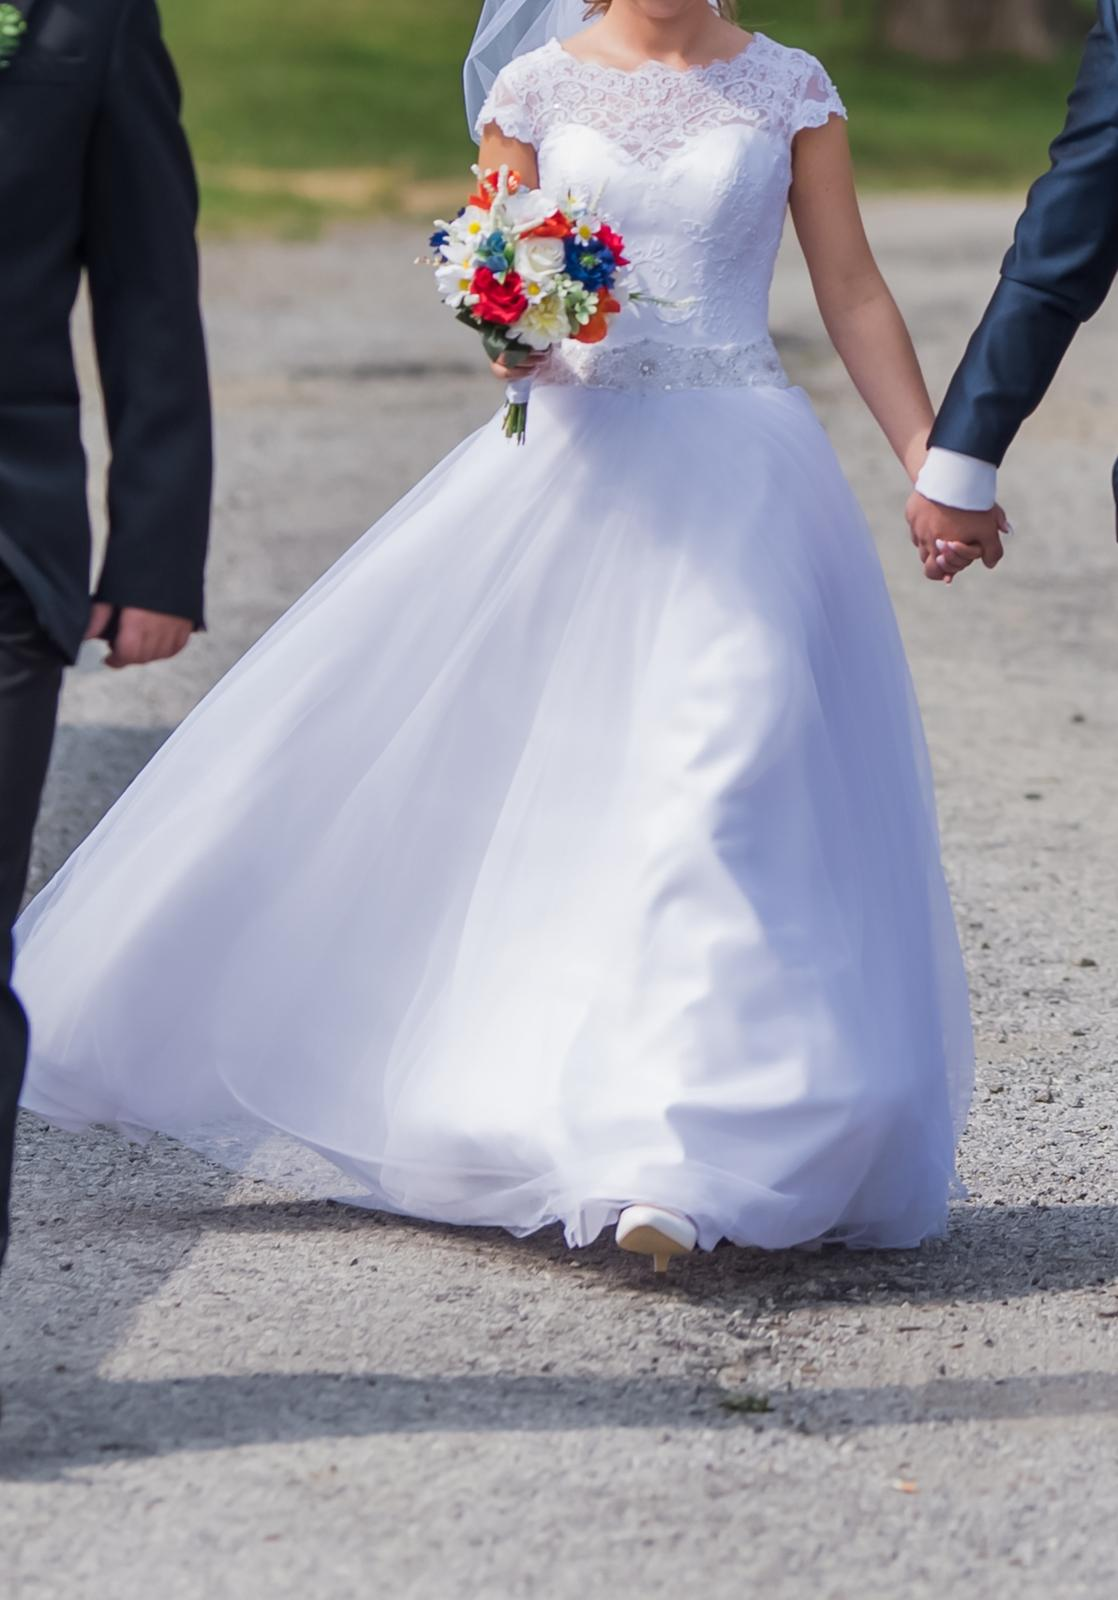 Emmi mariage svad. šaty - Obrázok č. 3